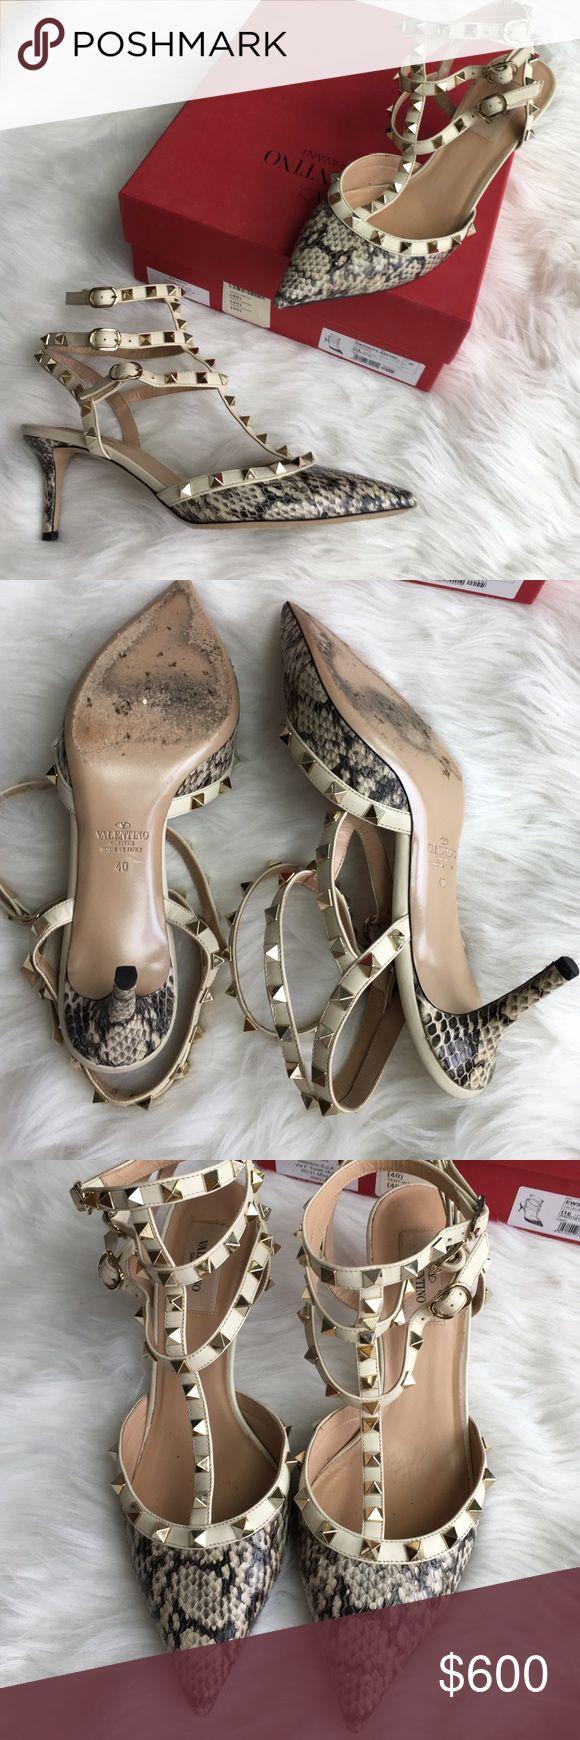 Valentino rockstud pumps Extremely rare Python kitten heel Valentino pumps in amazing condition Valentino Shoes Heels